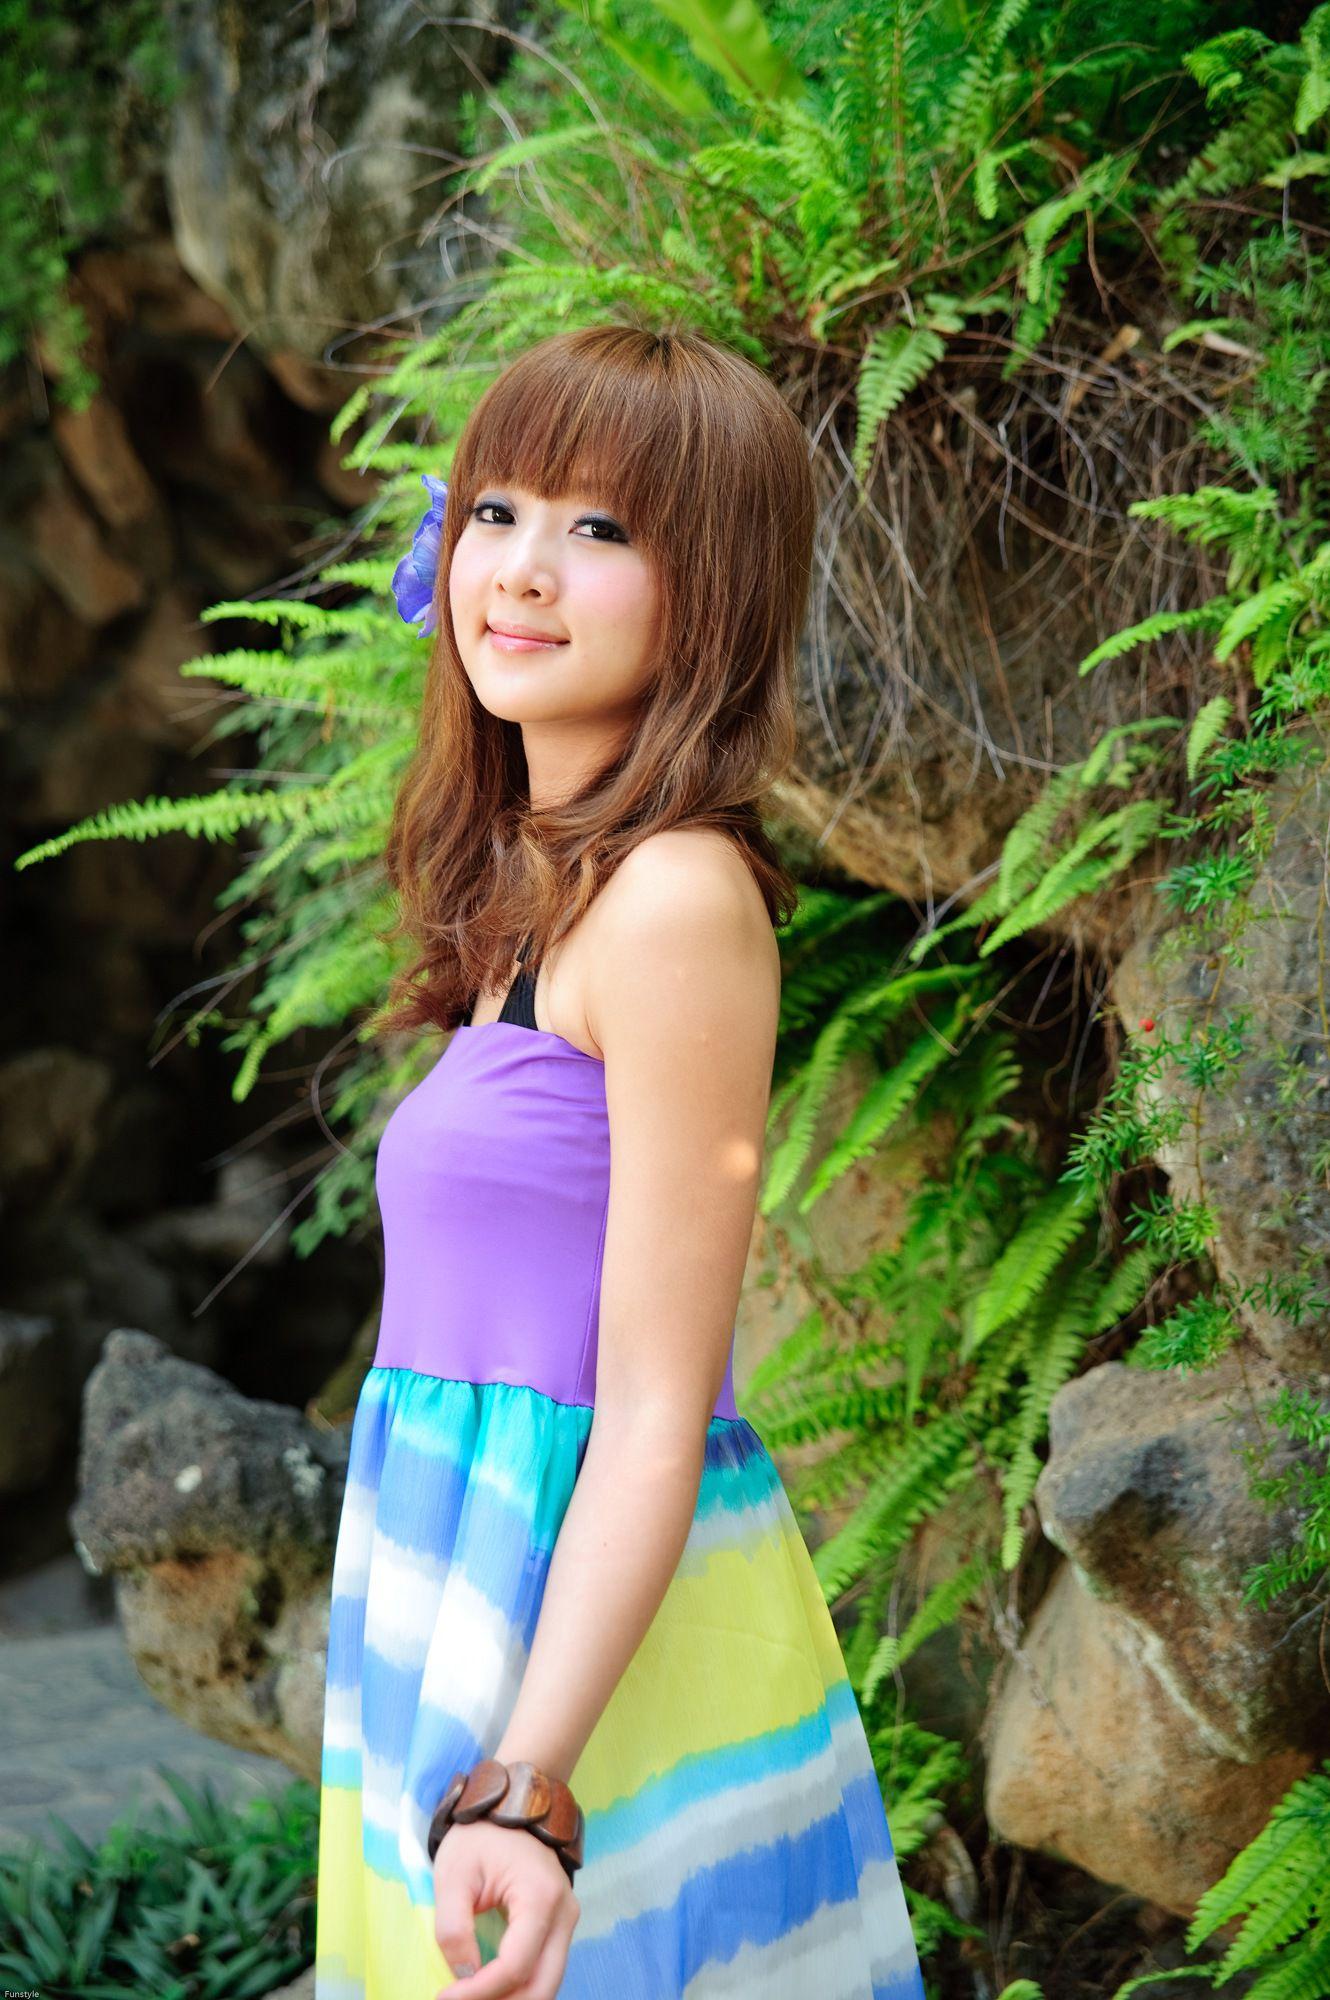 VOL.582 [台湾正妹]长裙极品清新唯美正妹:张凯洁(张允霏,果子MM)高品质写真套图(124P)